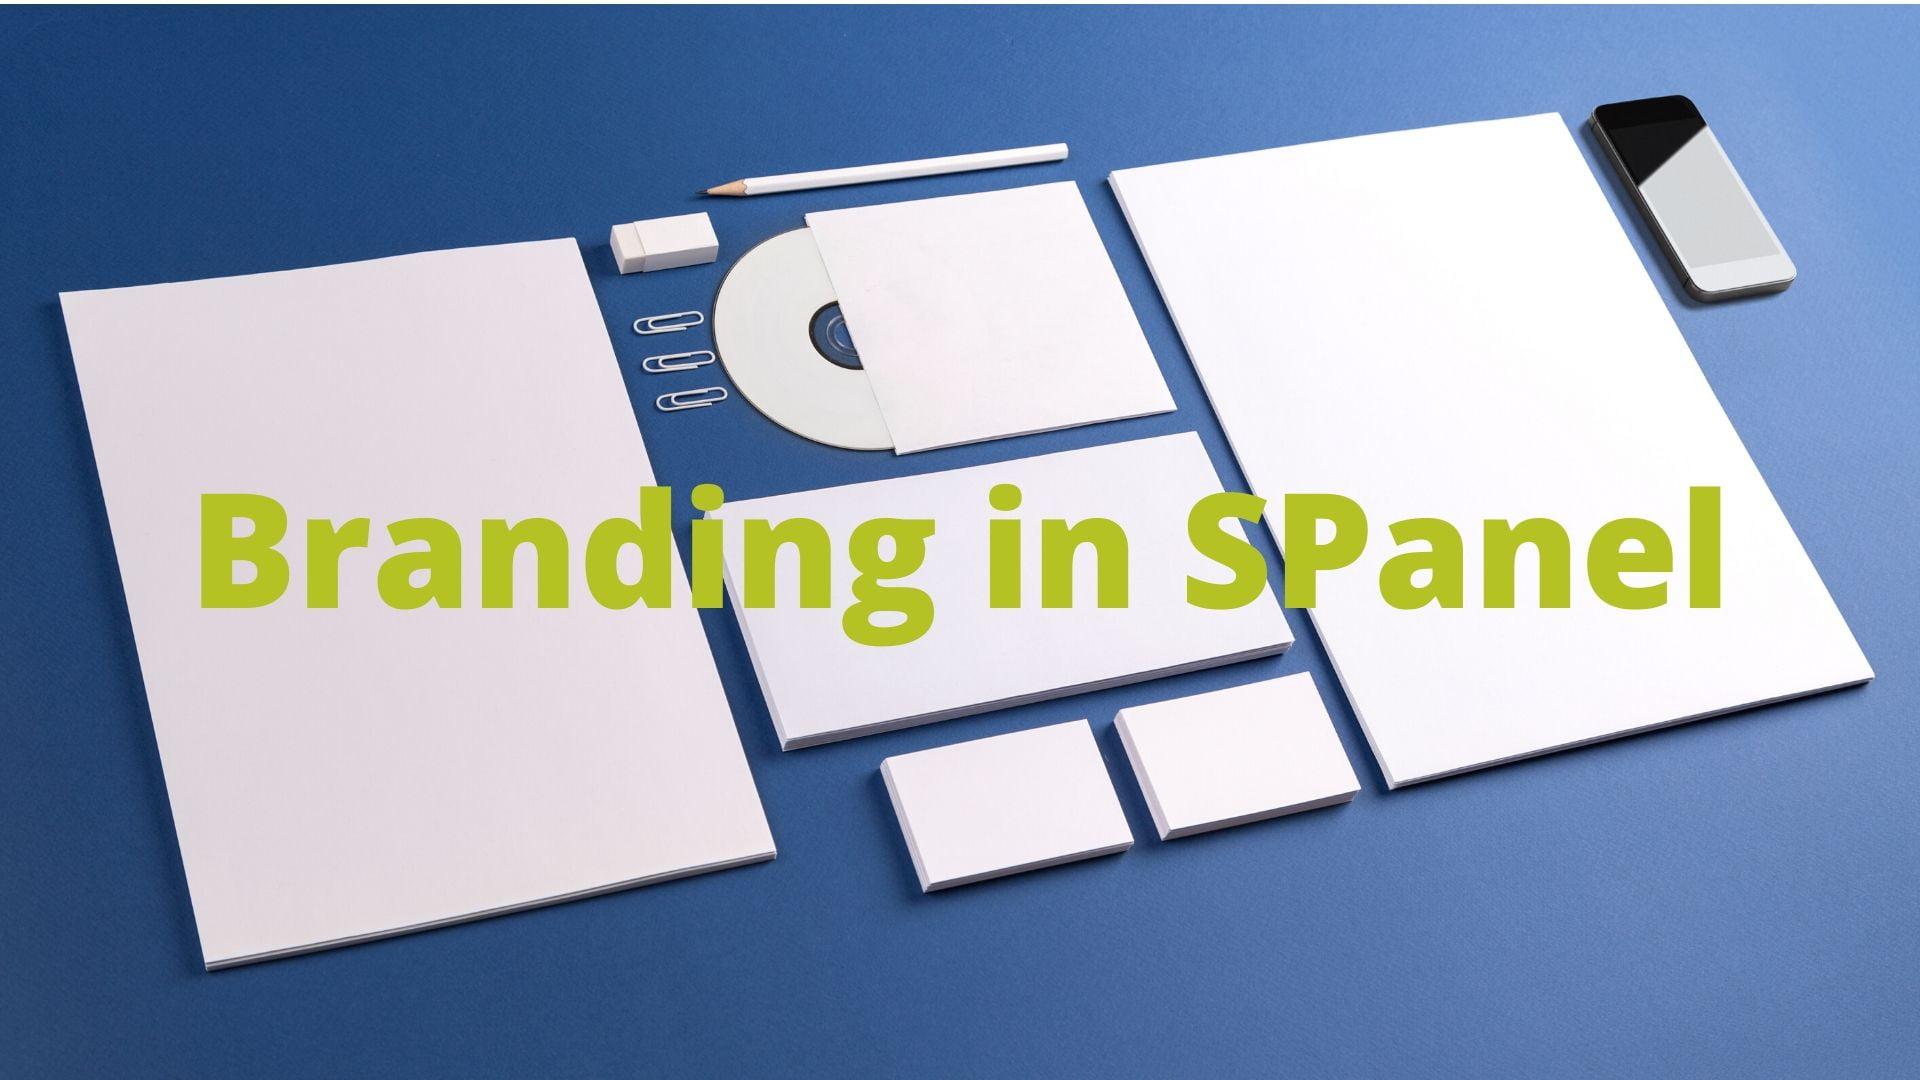 Branding-in-SPanel